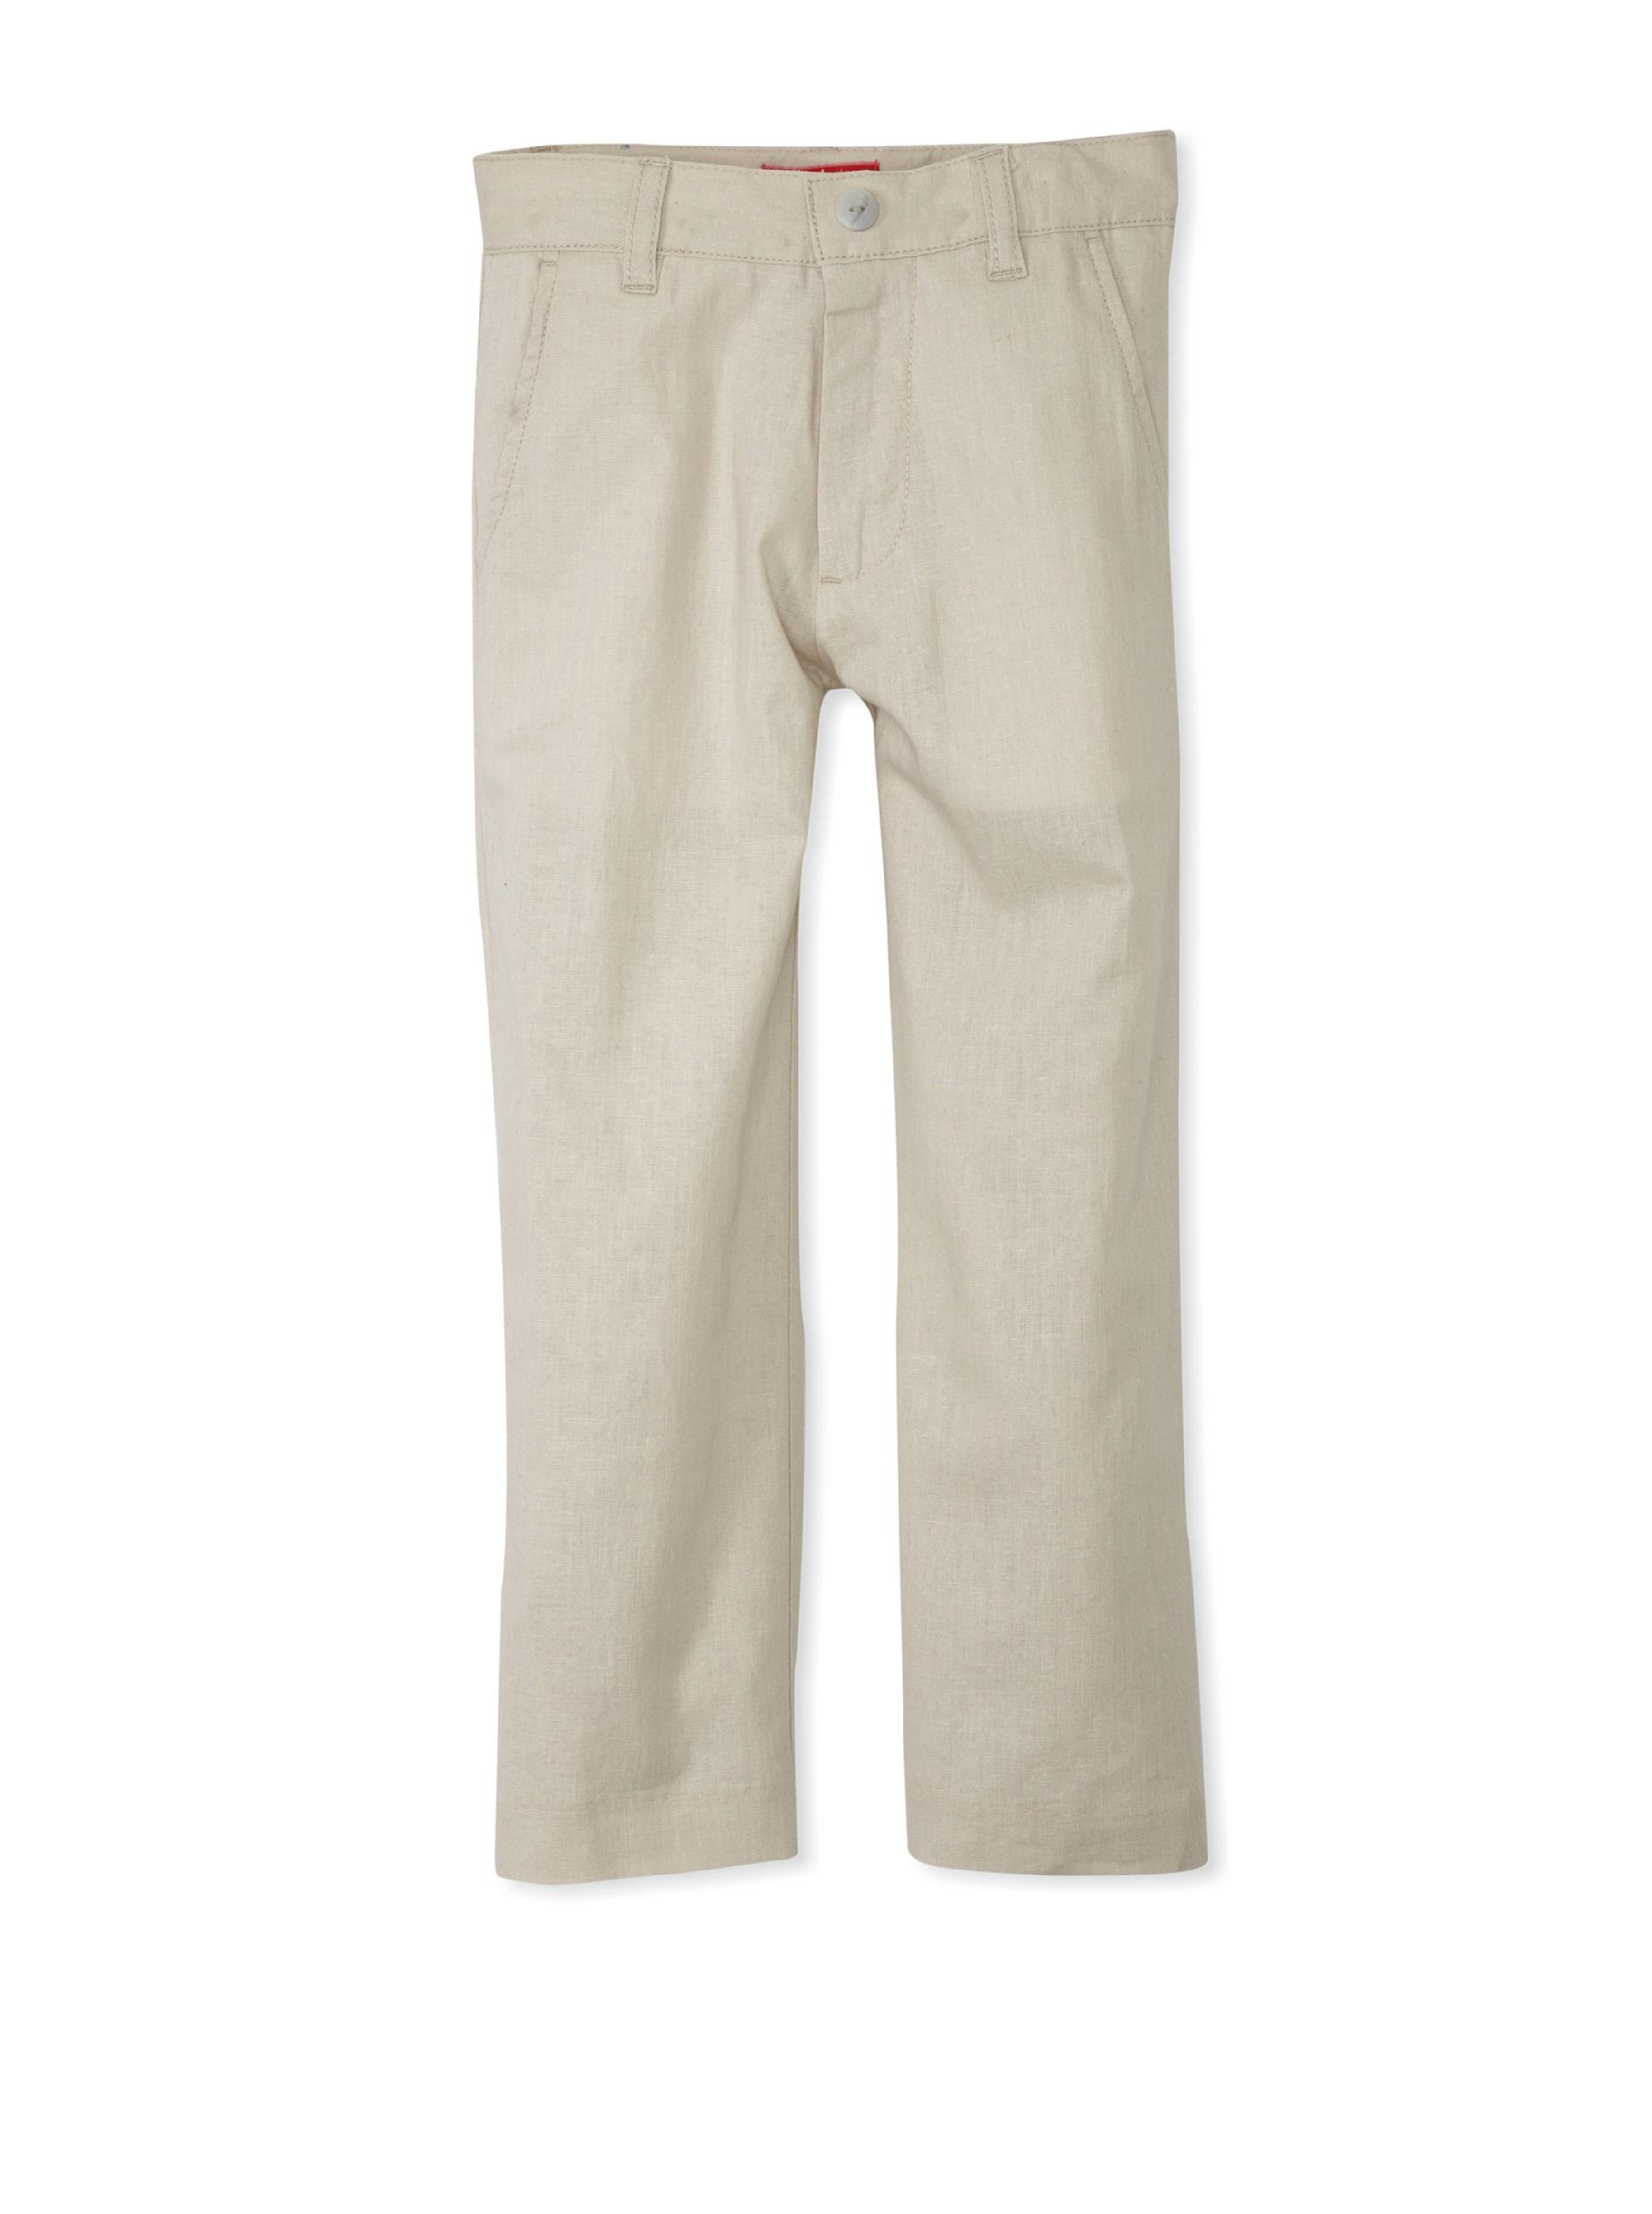 One Kid Boy's Flat-Front Pants (Sand)